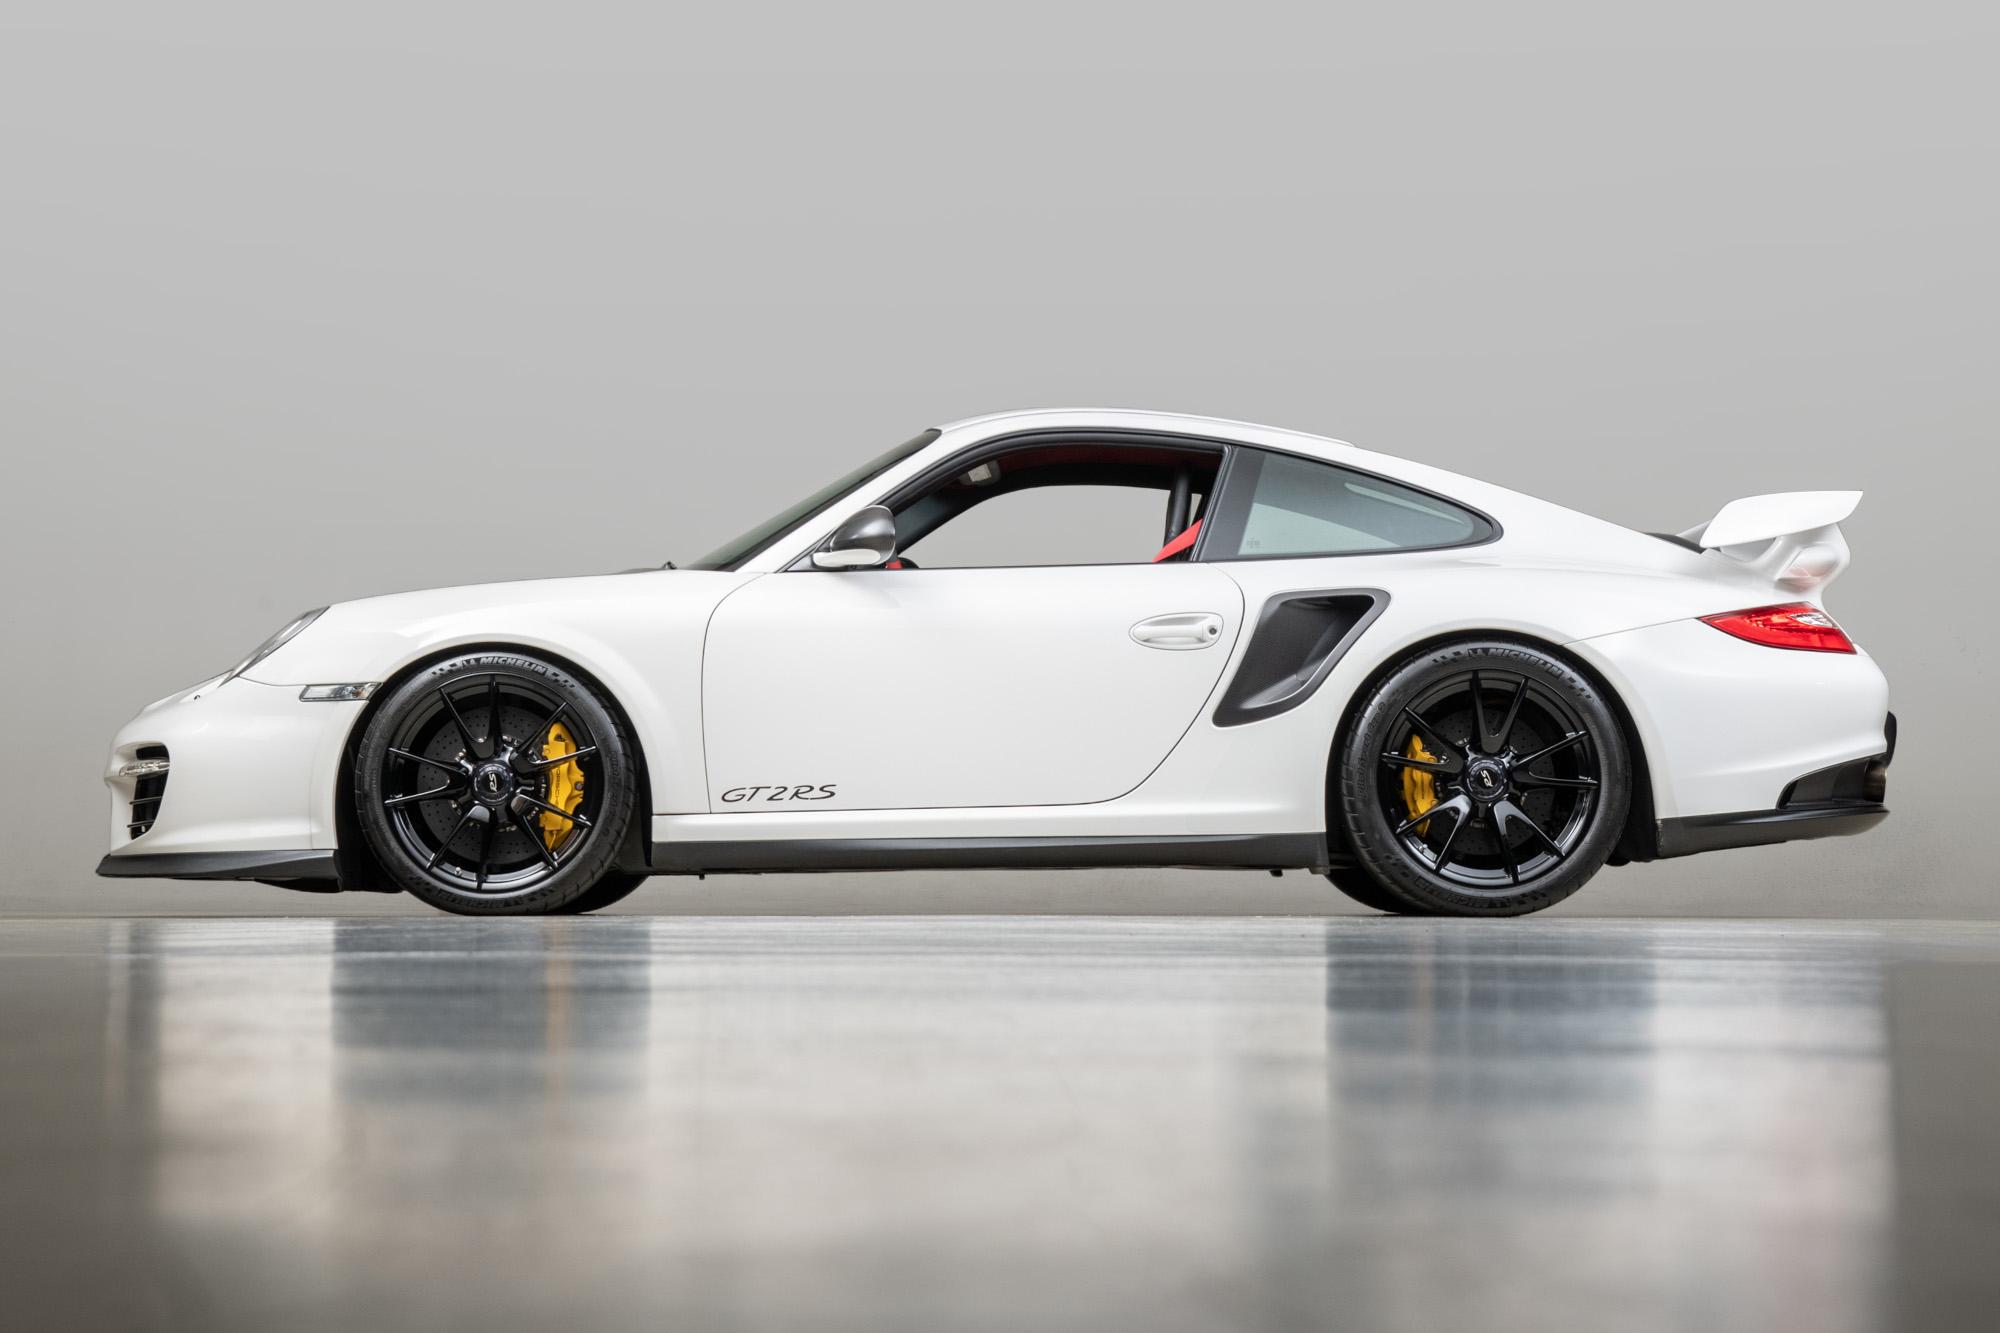 2011 Porsche GT2RS , WHITE, VIN WP0AE2A93BS778136, MILEAGE 7729